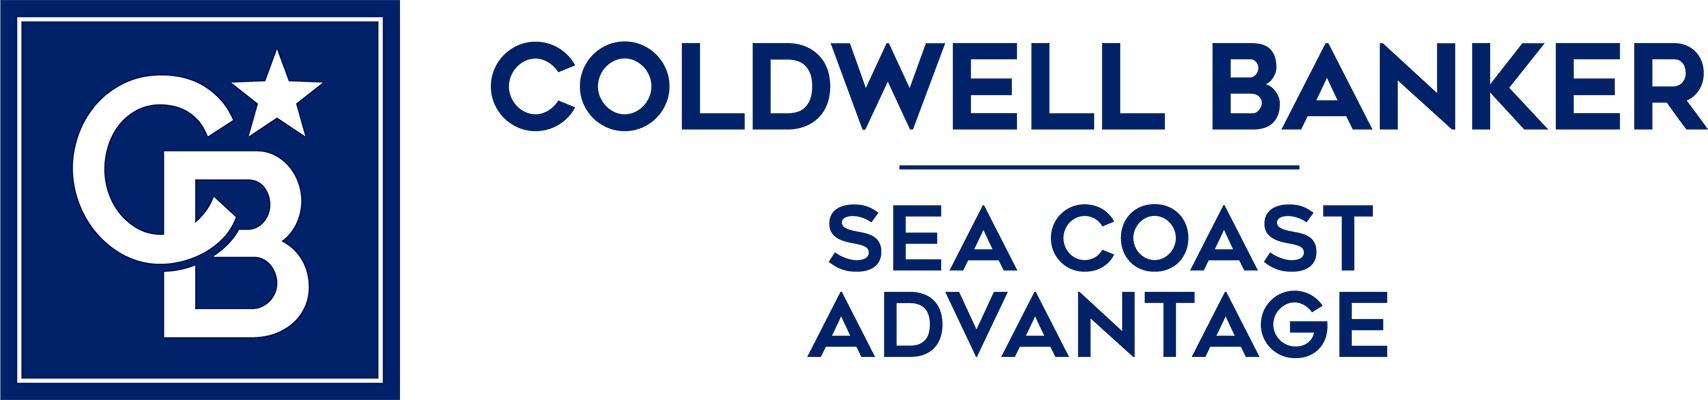 Margaret Young - Coldwell Banker Sea Coast Advantage Realty Logo